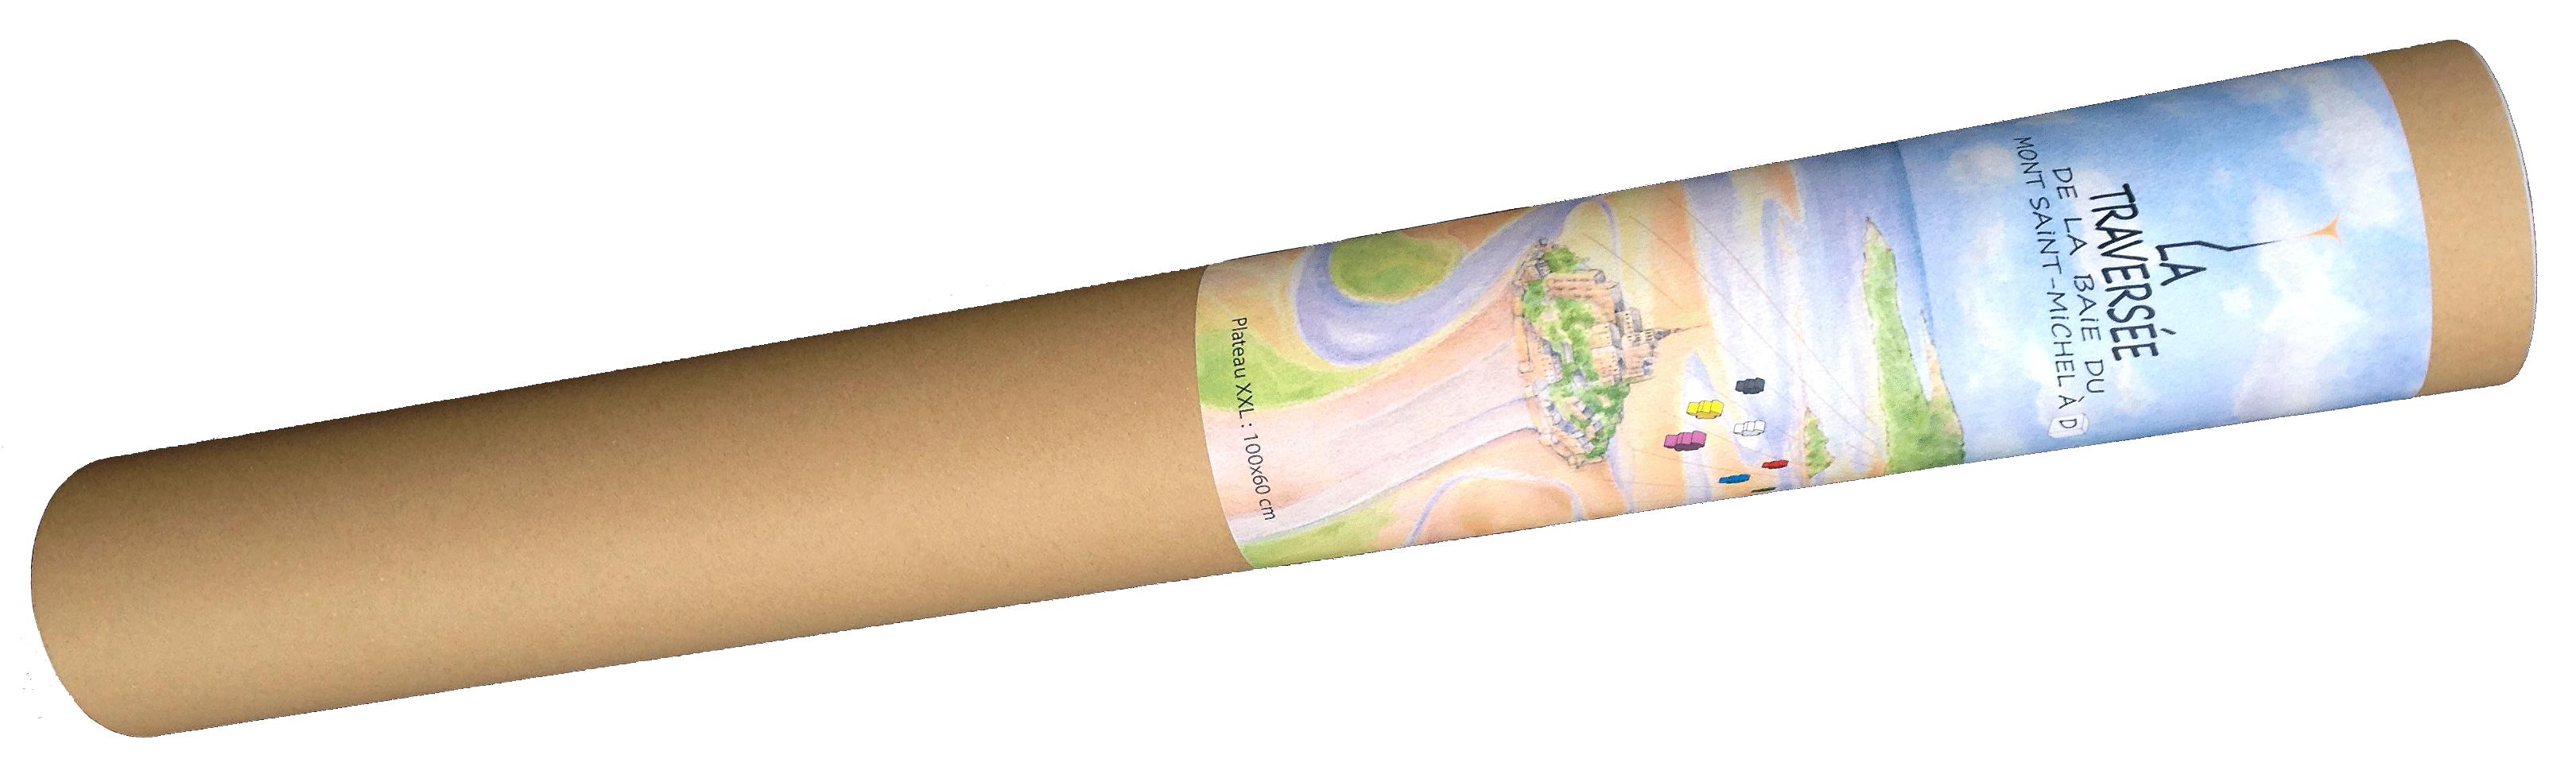 Tube-LA-TRAVERSEE